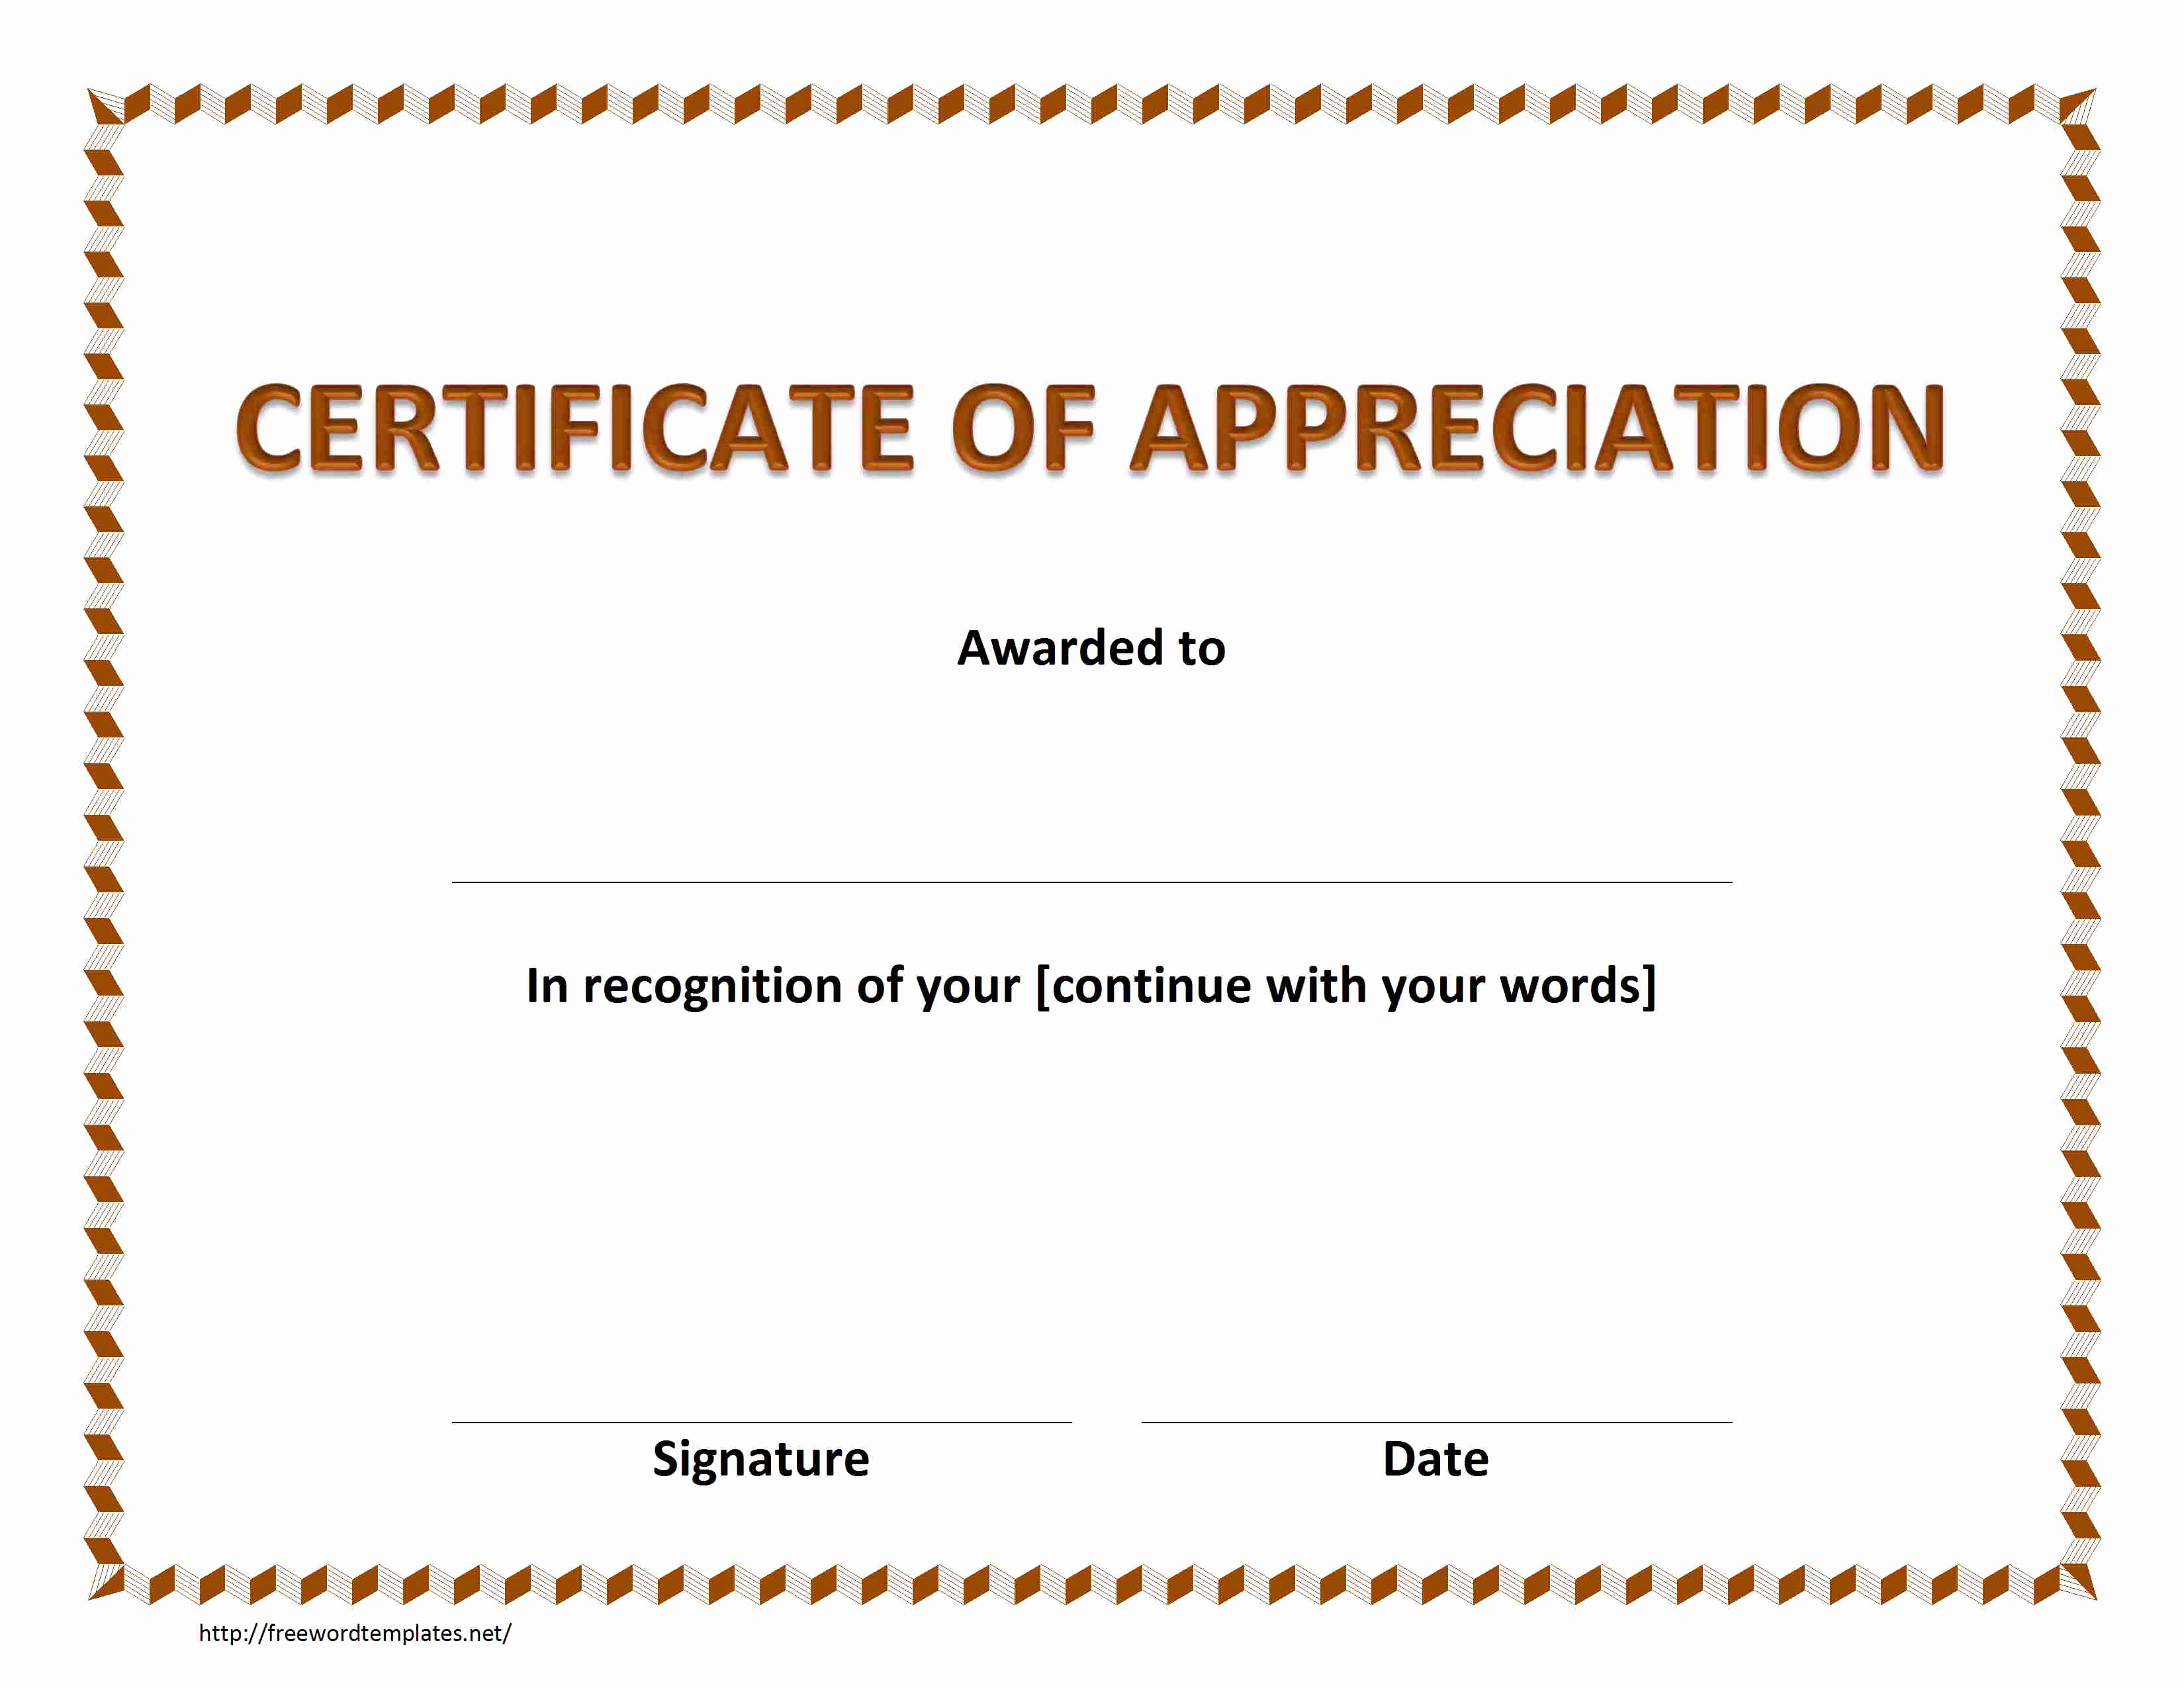 Certificate Of Appreciation Wording Beautiful Certificate Of Appreciation